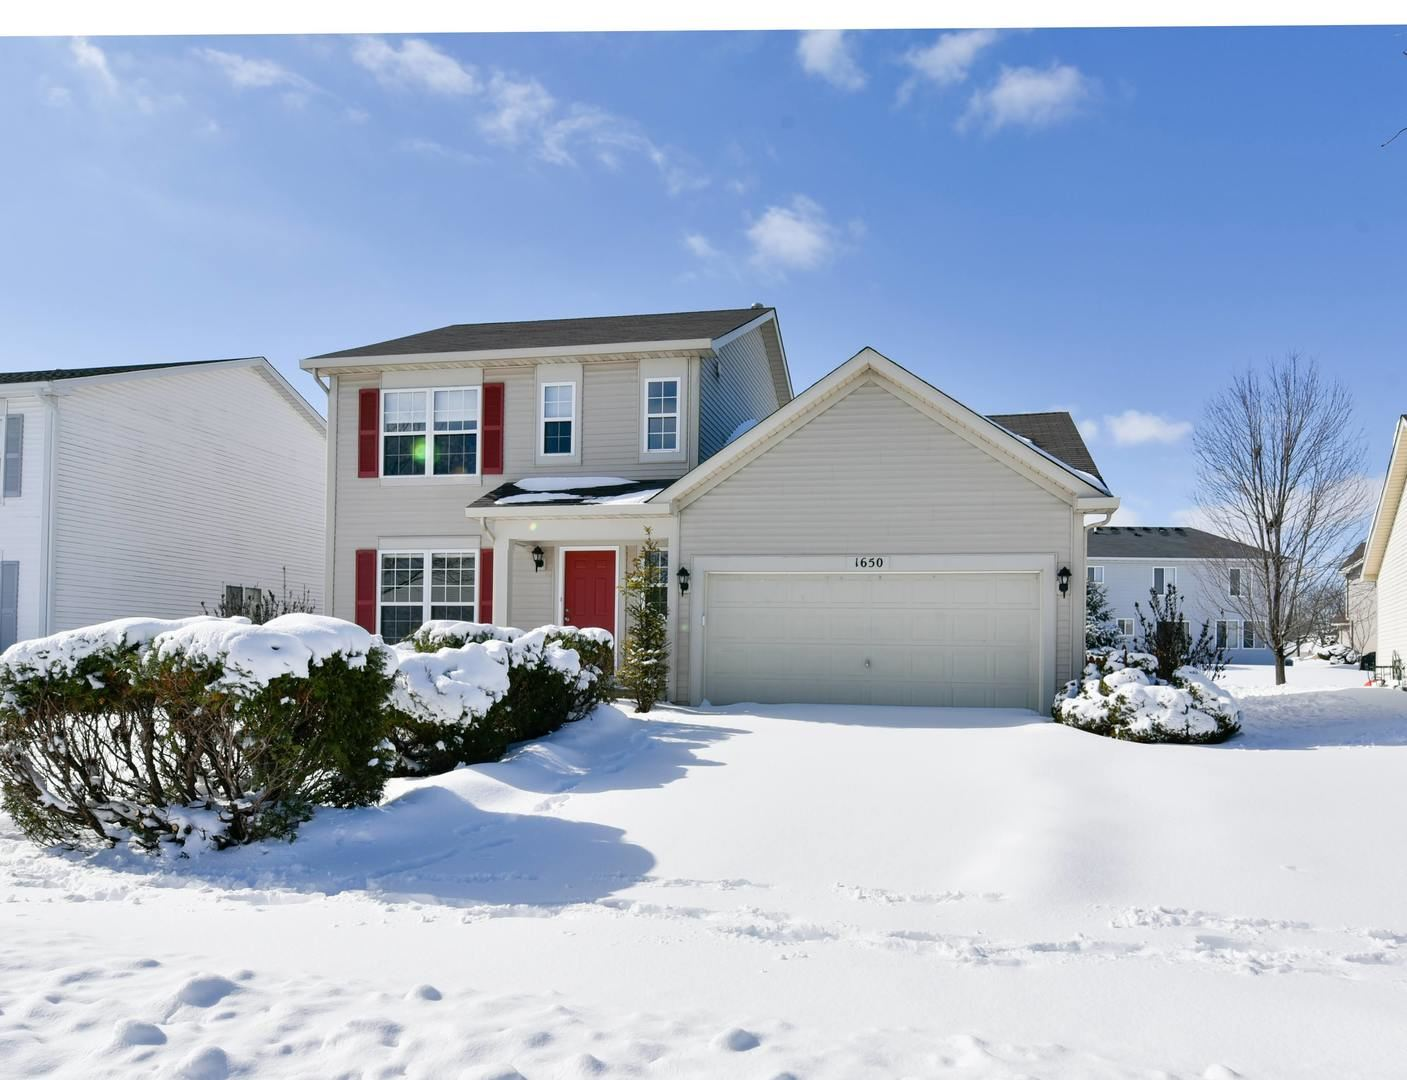 Photo of 1650 Fiddyment Drive, Romeoville, IL 60446 (MLS # 10985304)